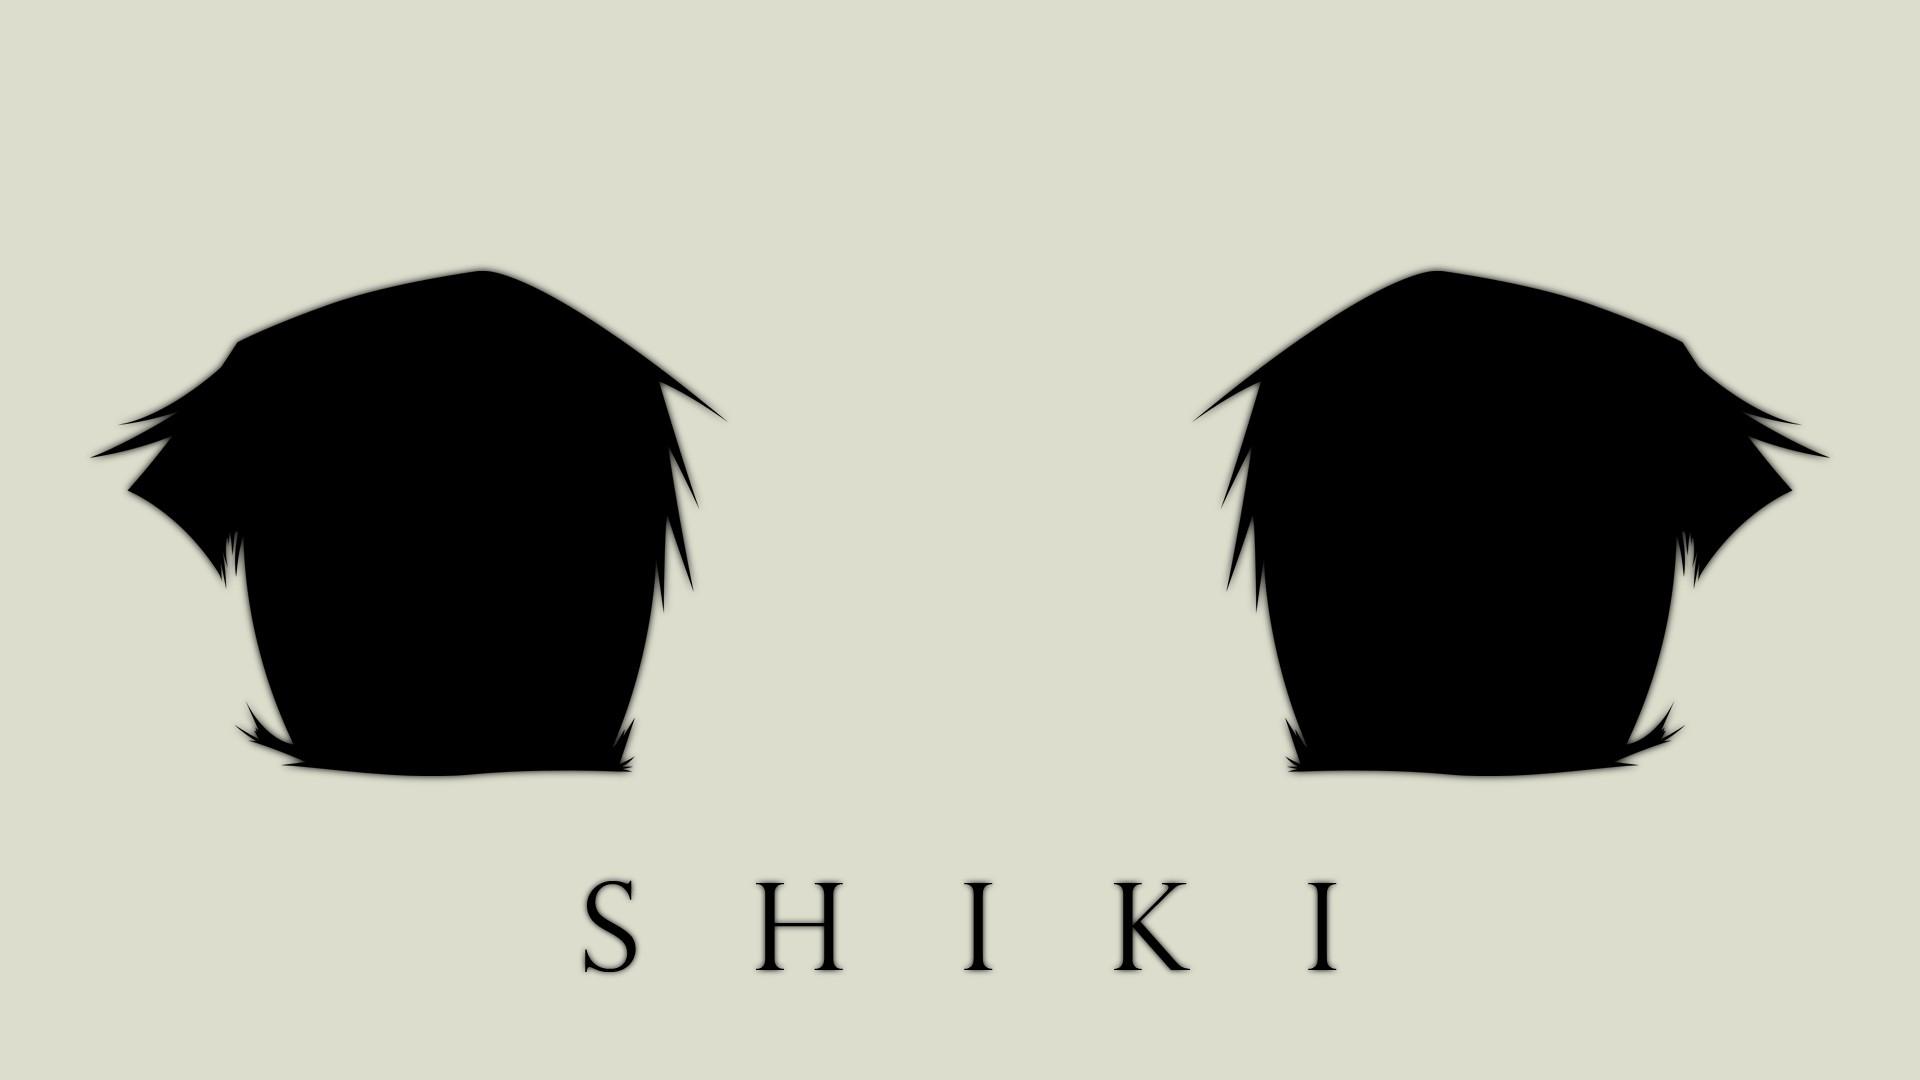 Wallpaper : drawing, illustration, silhouette, logo, Shiki, brand